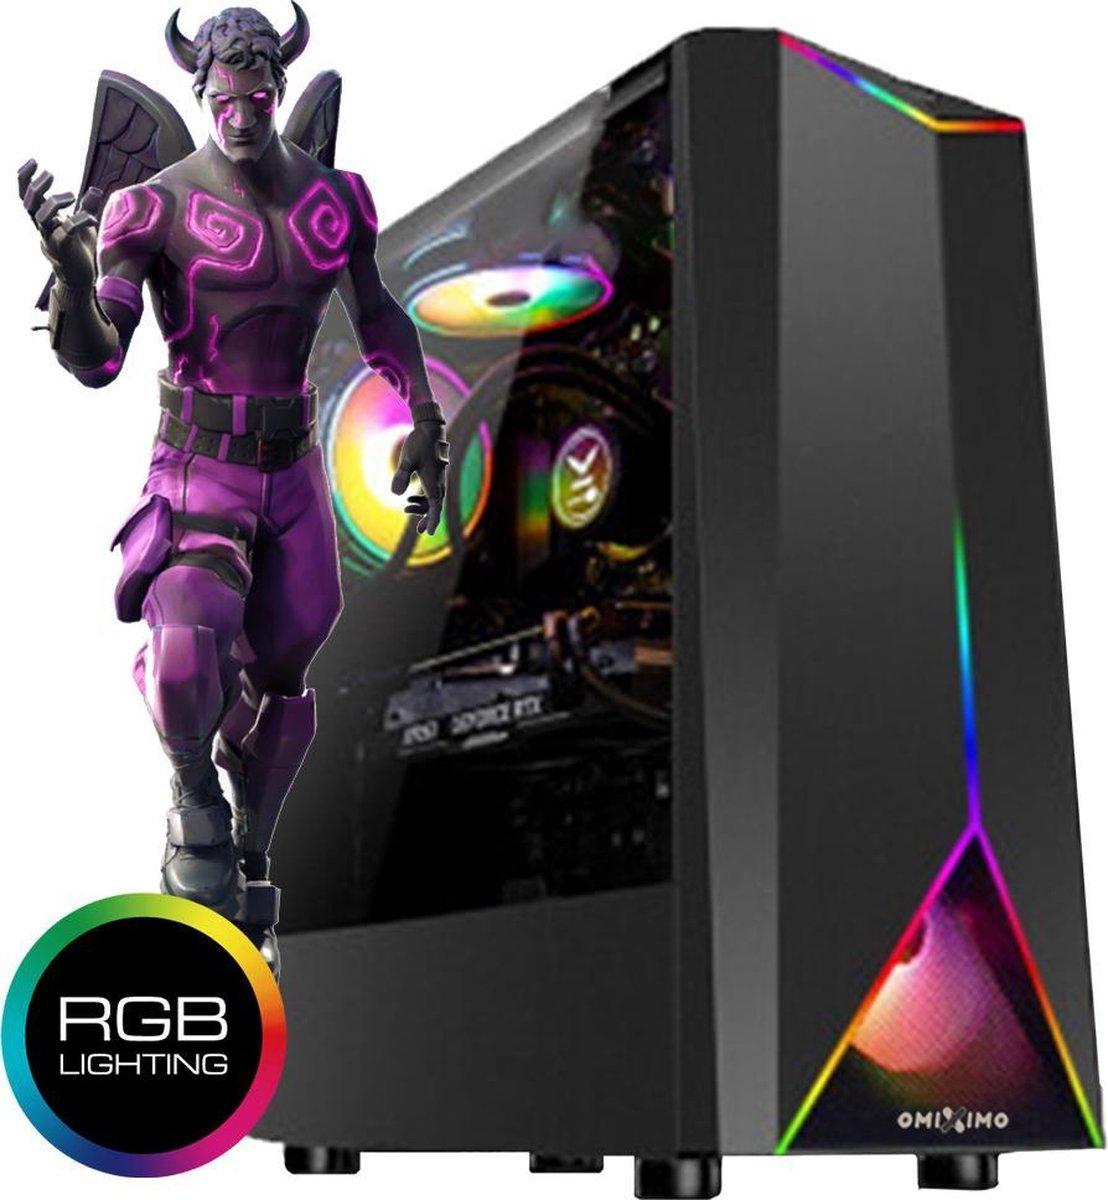 omiXimo | AMD GeForce GTX1030 Gaming PC | 8 GB | 500 GB SSD